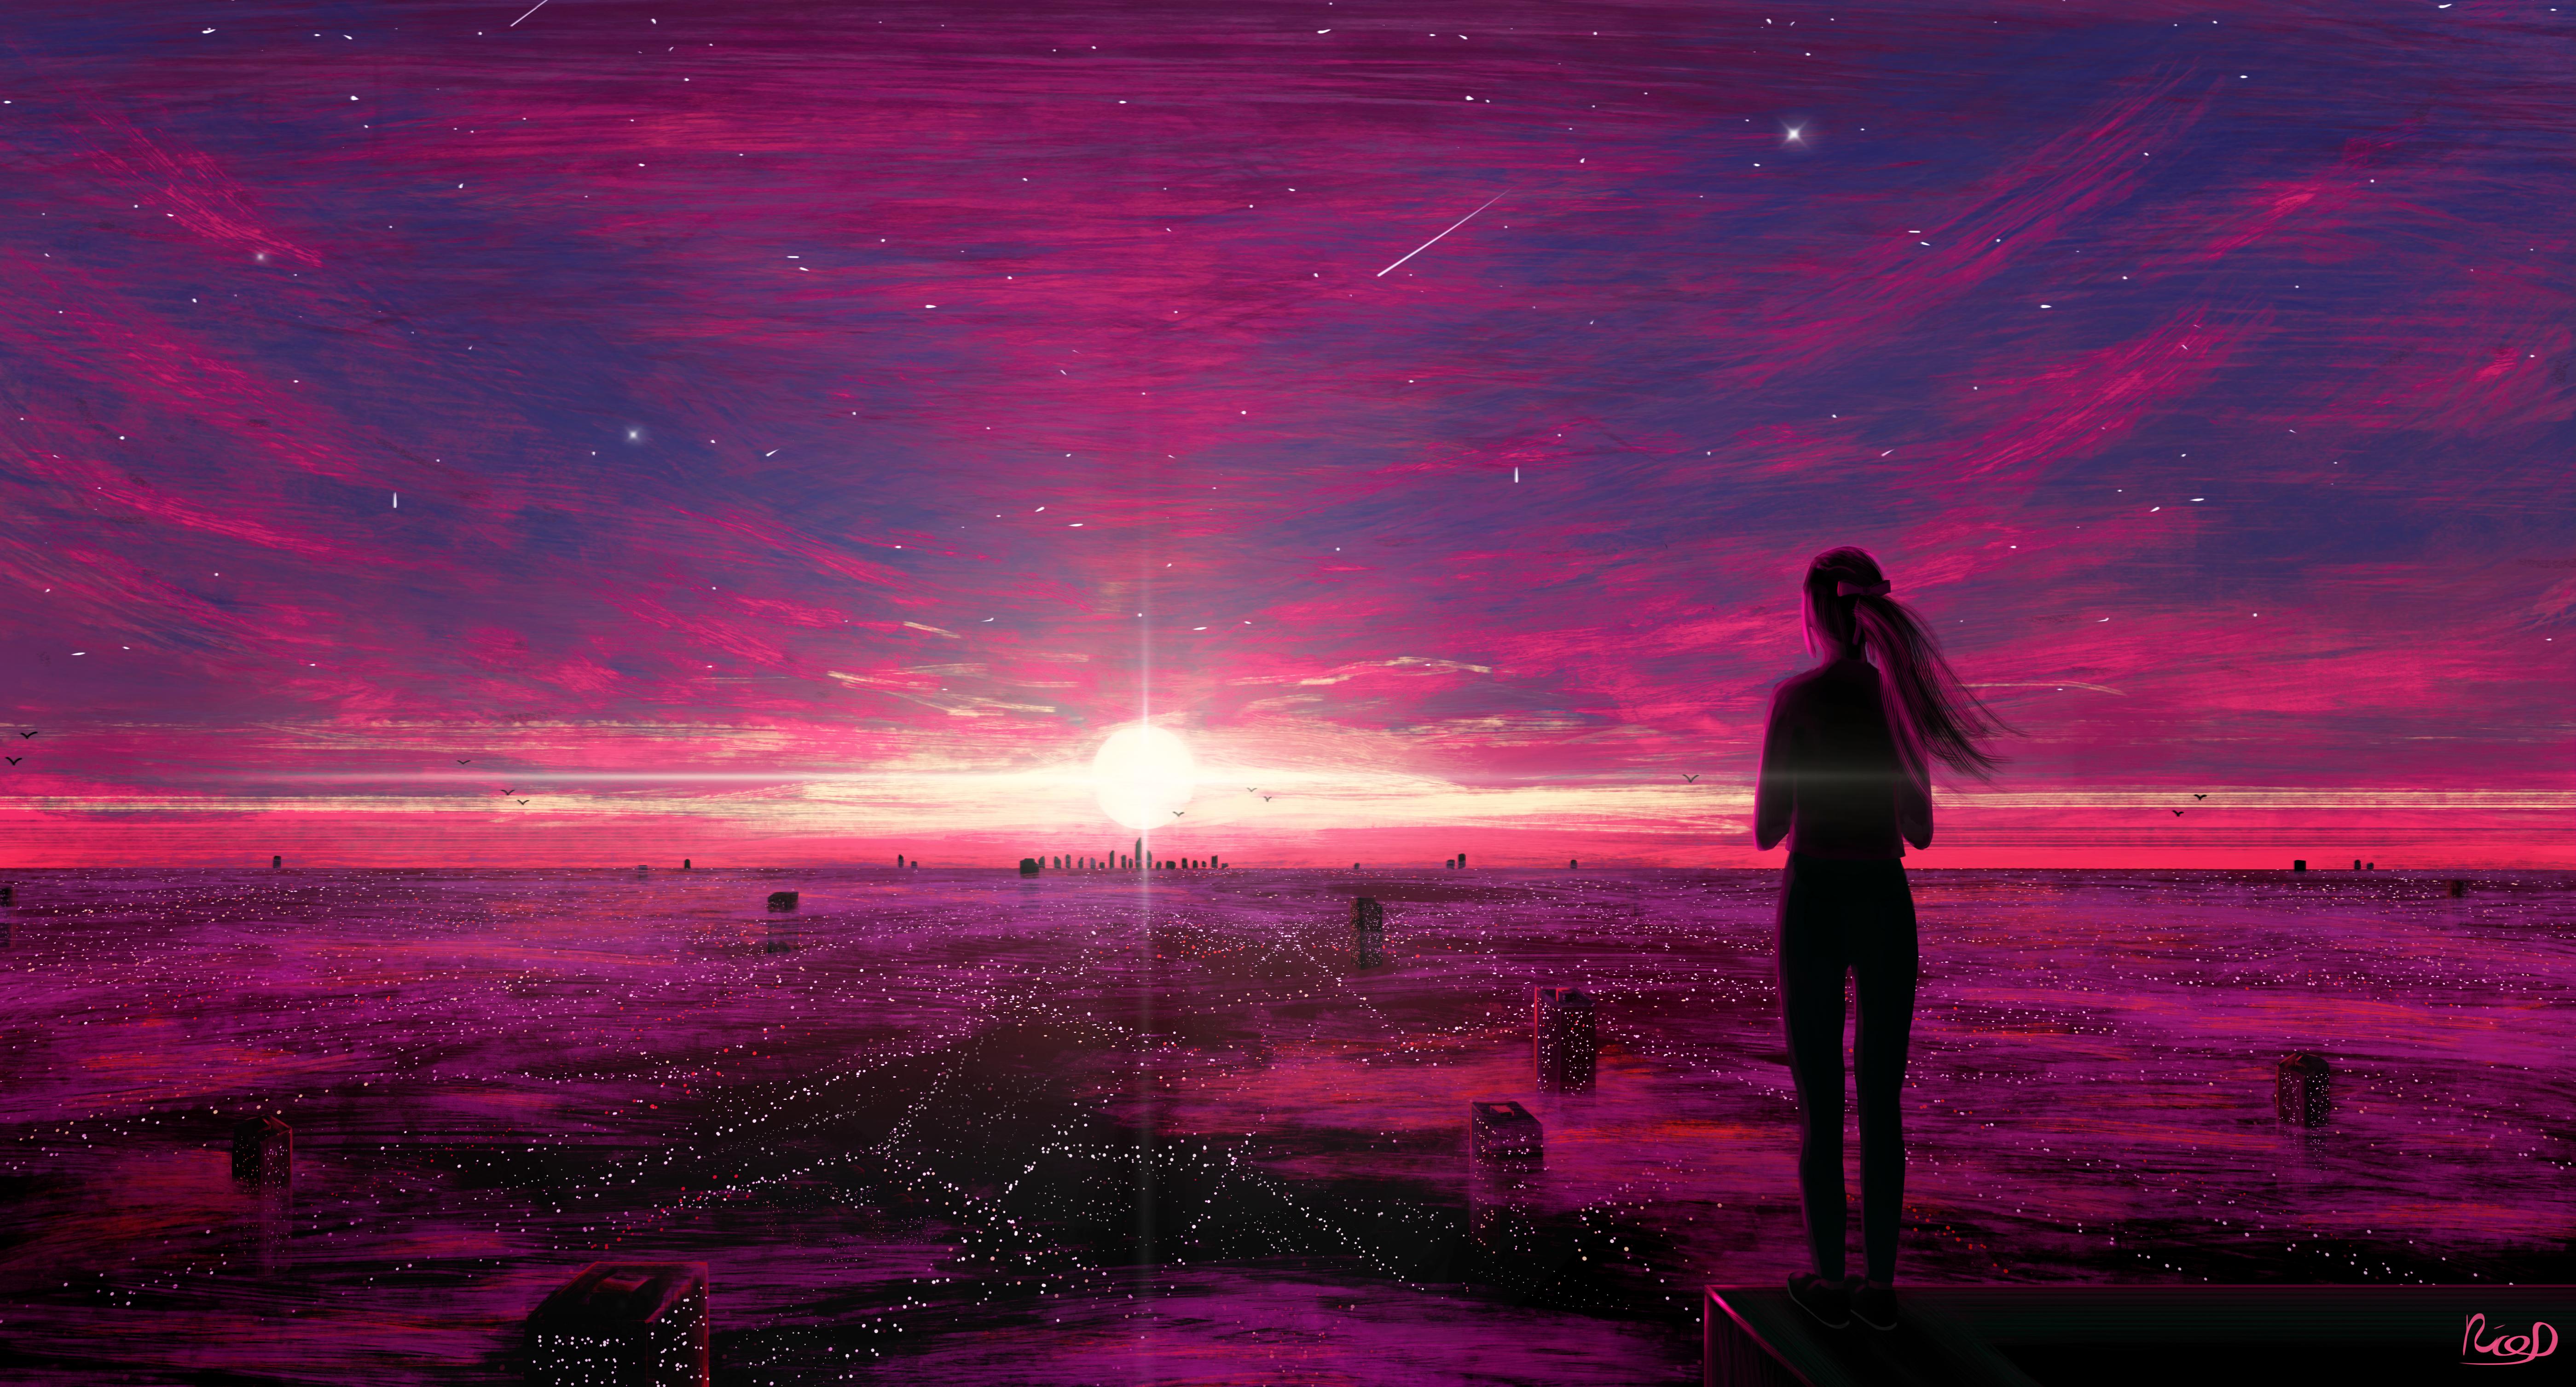 Soar by RicoDZ